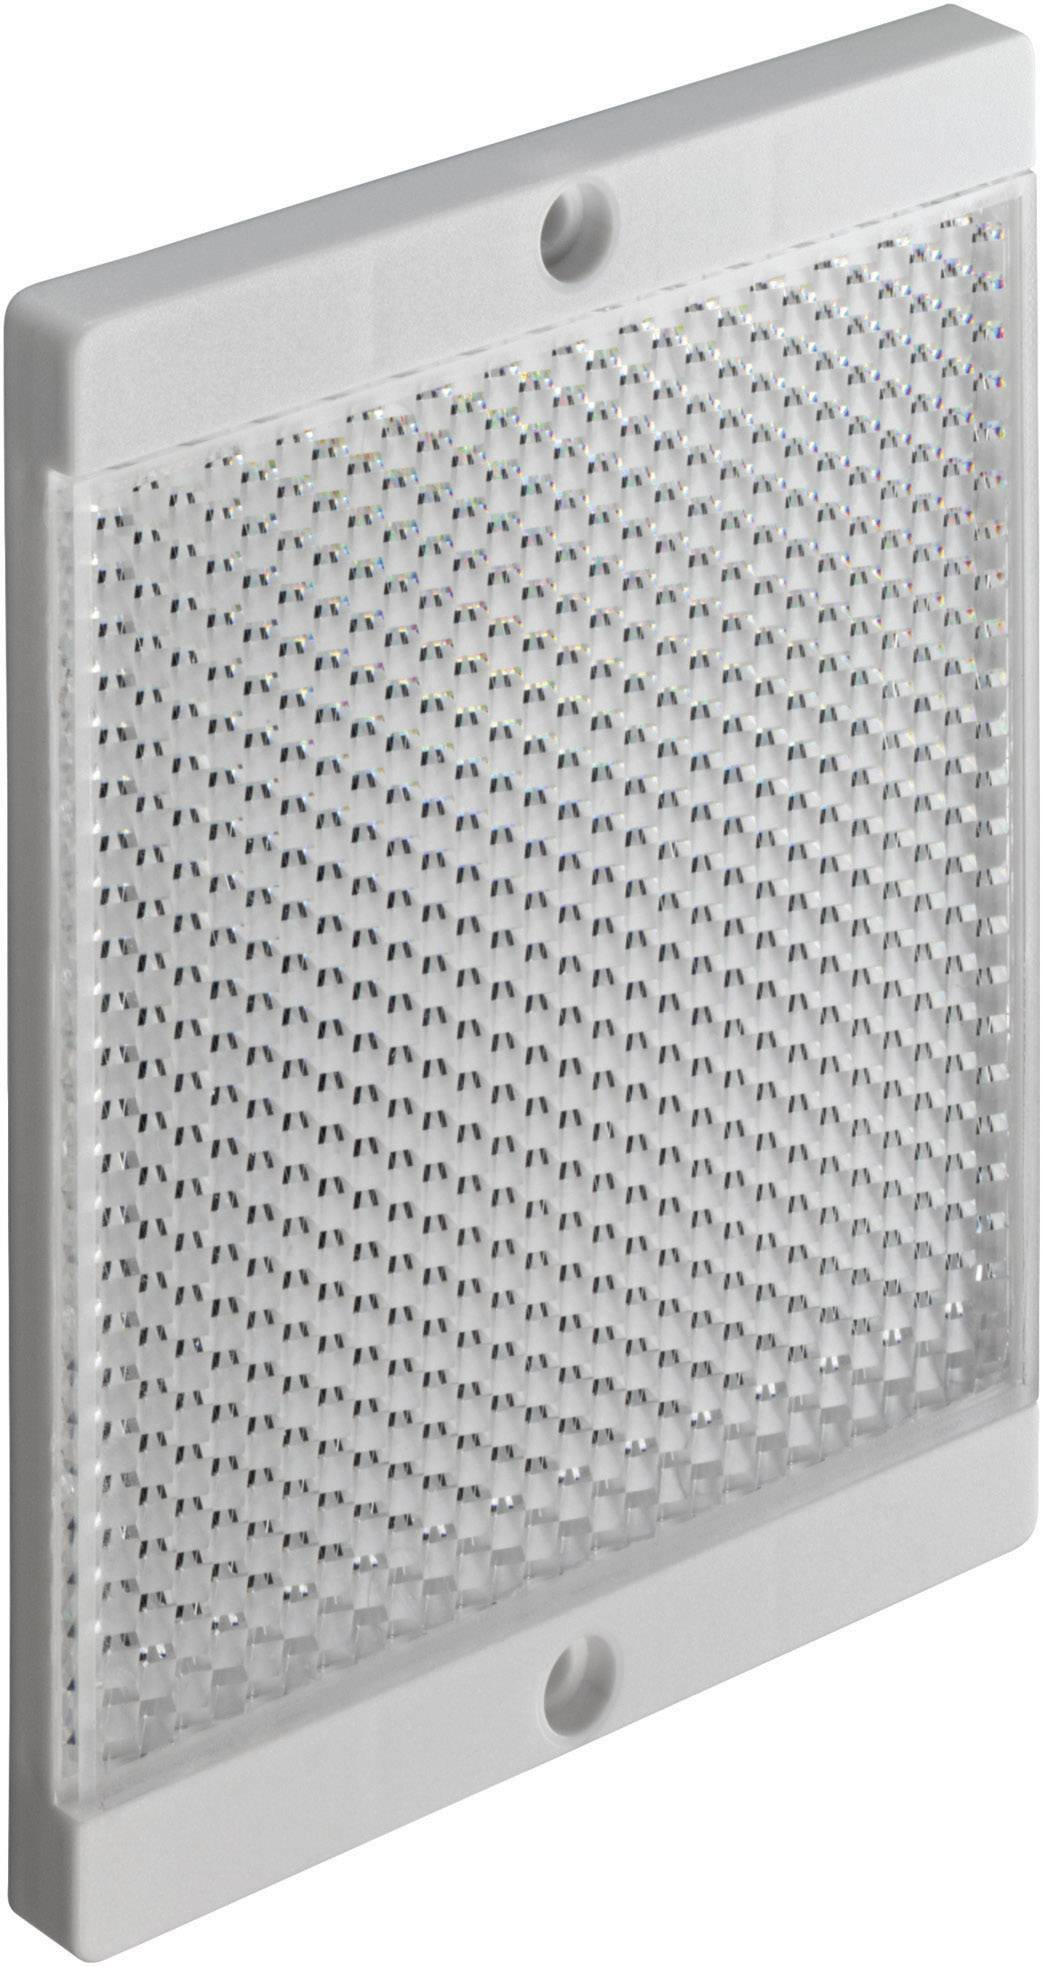 Reflexná odrazka pre svetelnú závoru Leuze Electronic TKS 100 x 100 mm, 50022816